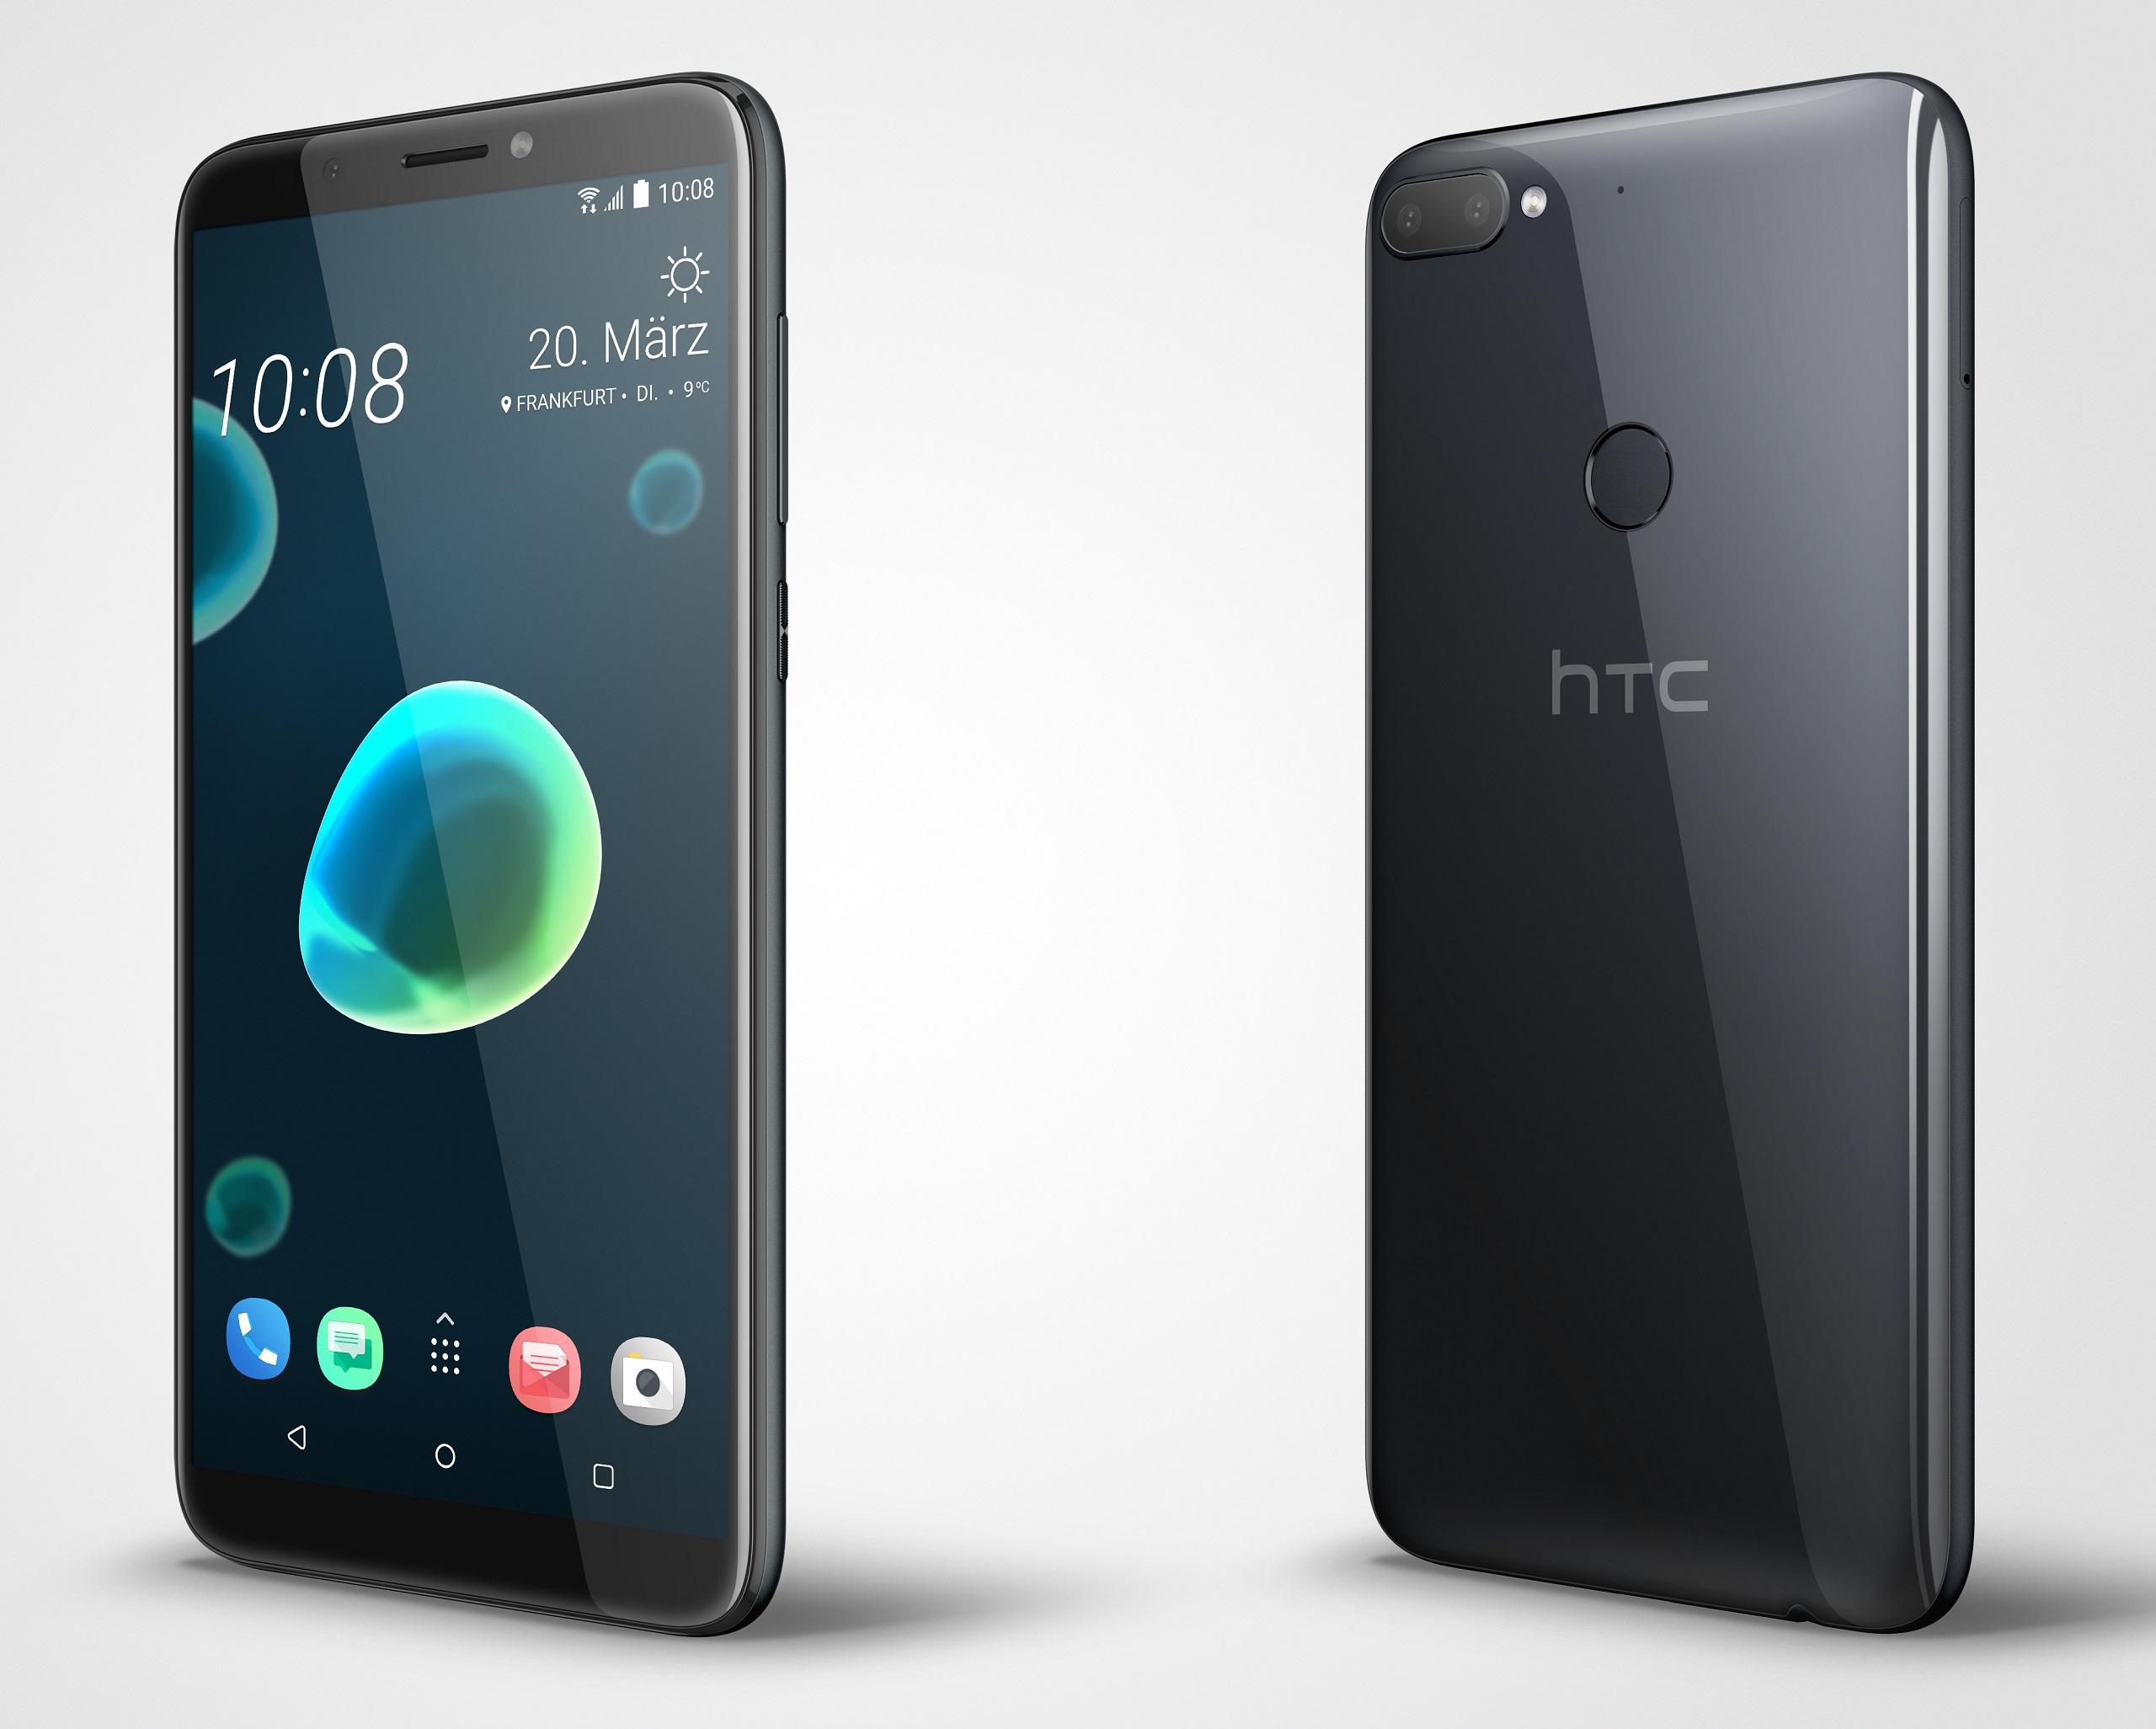 htc desire 12 plus smartphone review notebookcheck net reviews rh notebookcheck net HTC One M8 HTC EVO 4G LTE